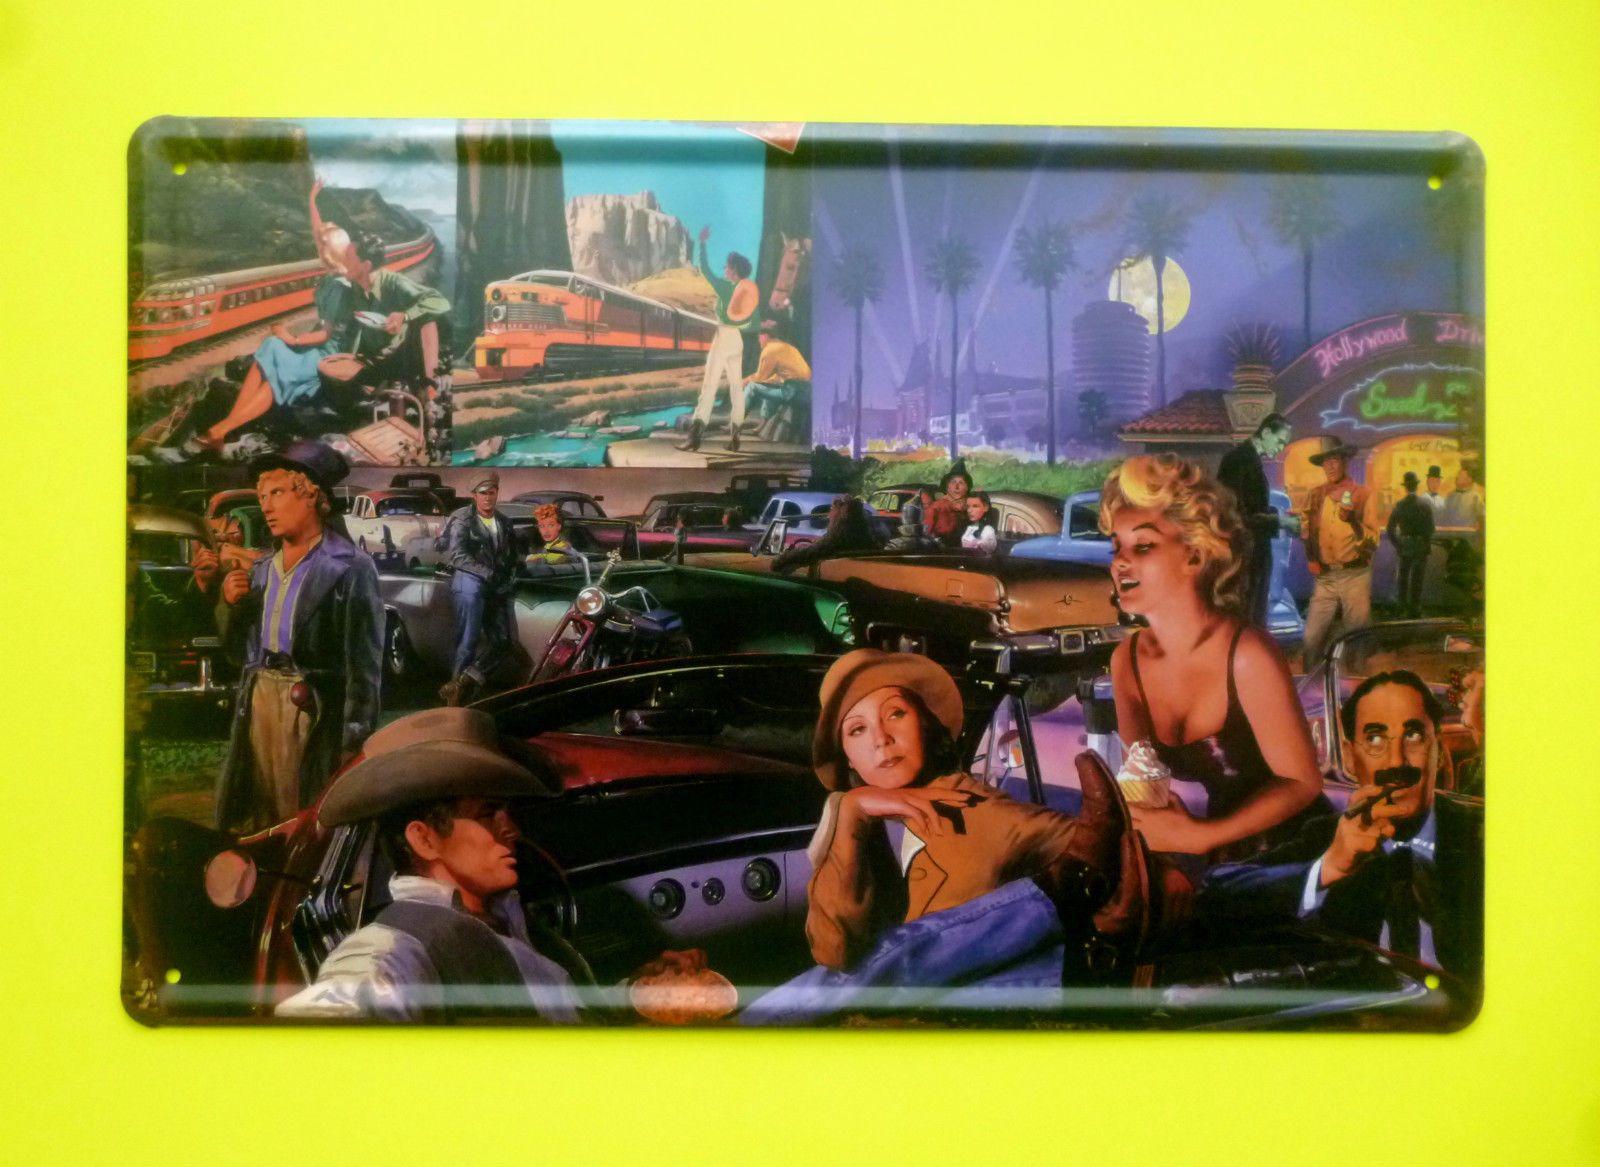 Nostalgie Blechschild Hollywood Film Kino Dean Monroe Wayne Dick Doof  20 x 30